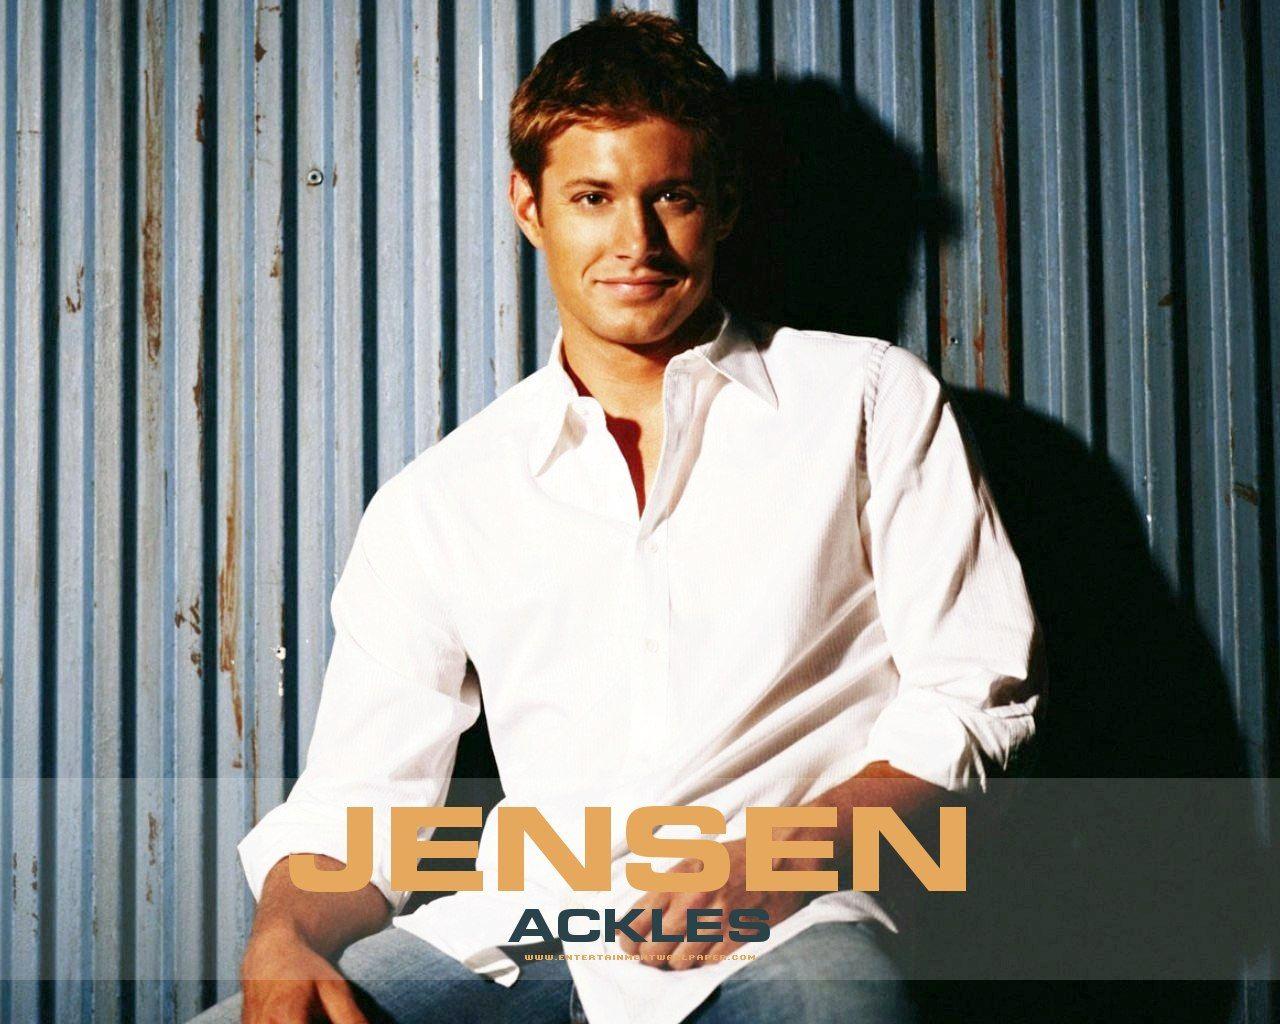 wallpaper de jensen ackles   Jensen Ackles - jensen-ackles wallpaper